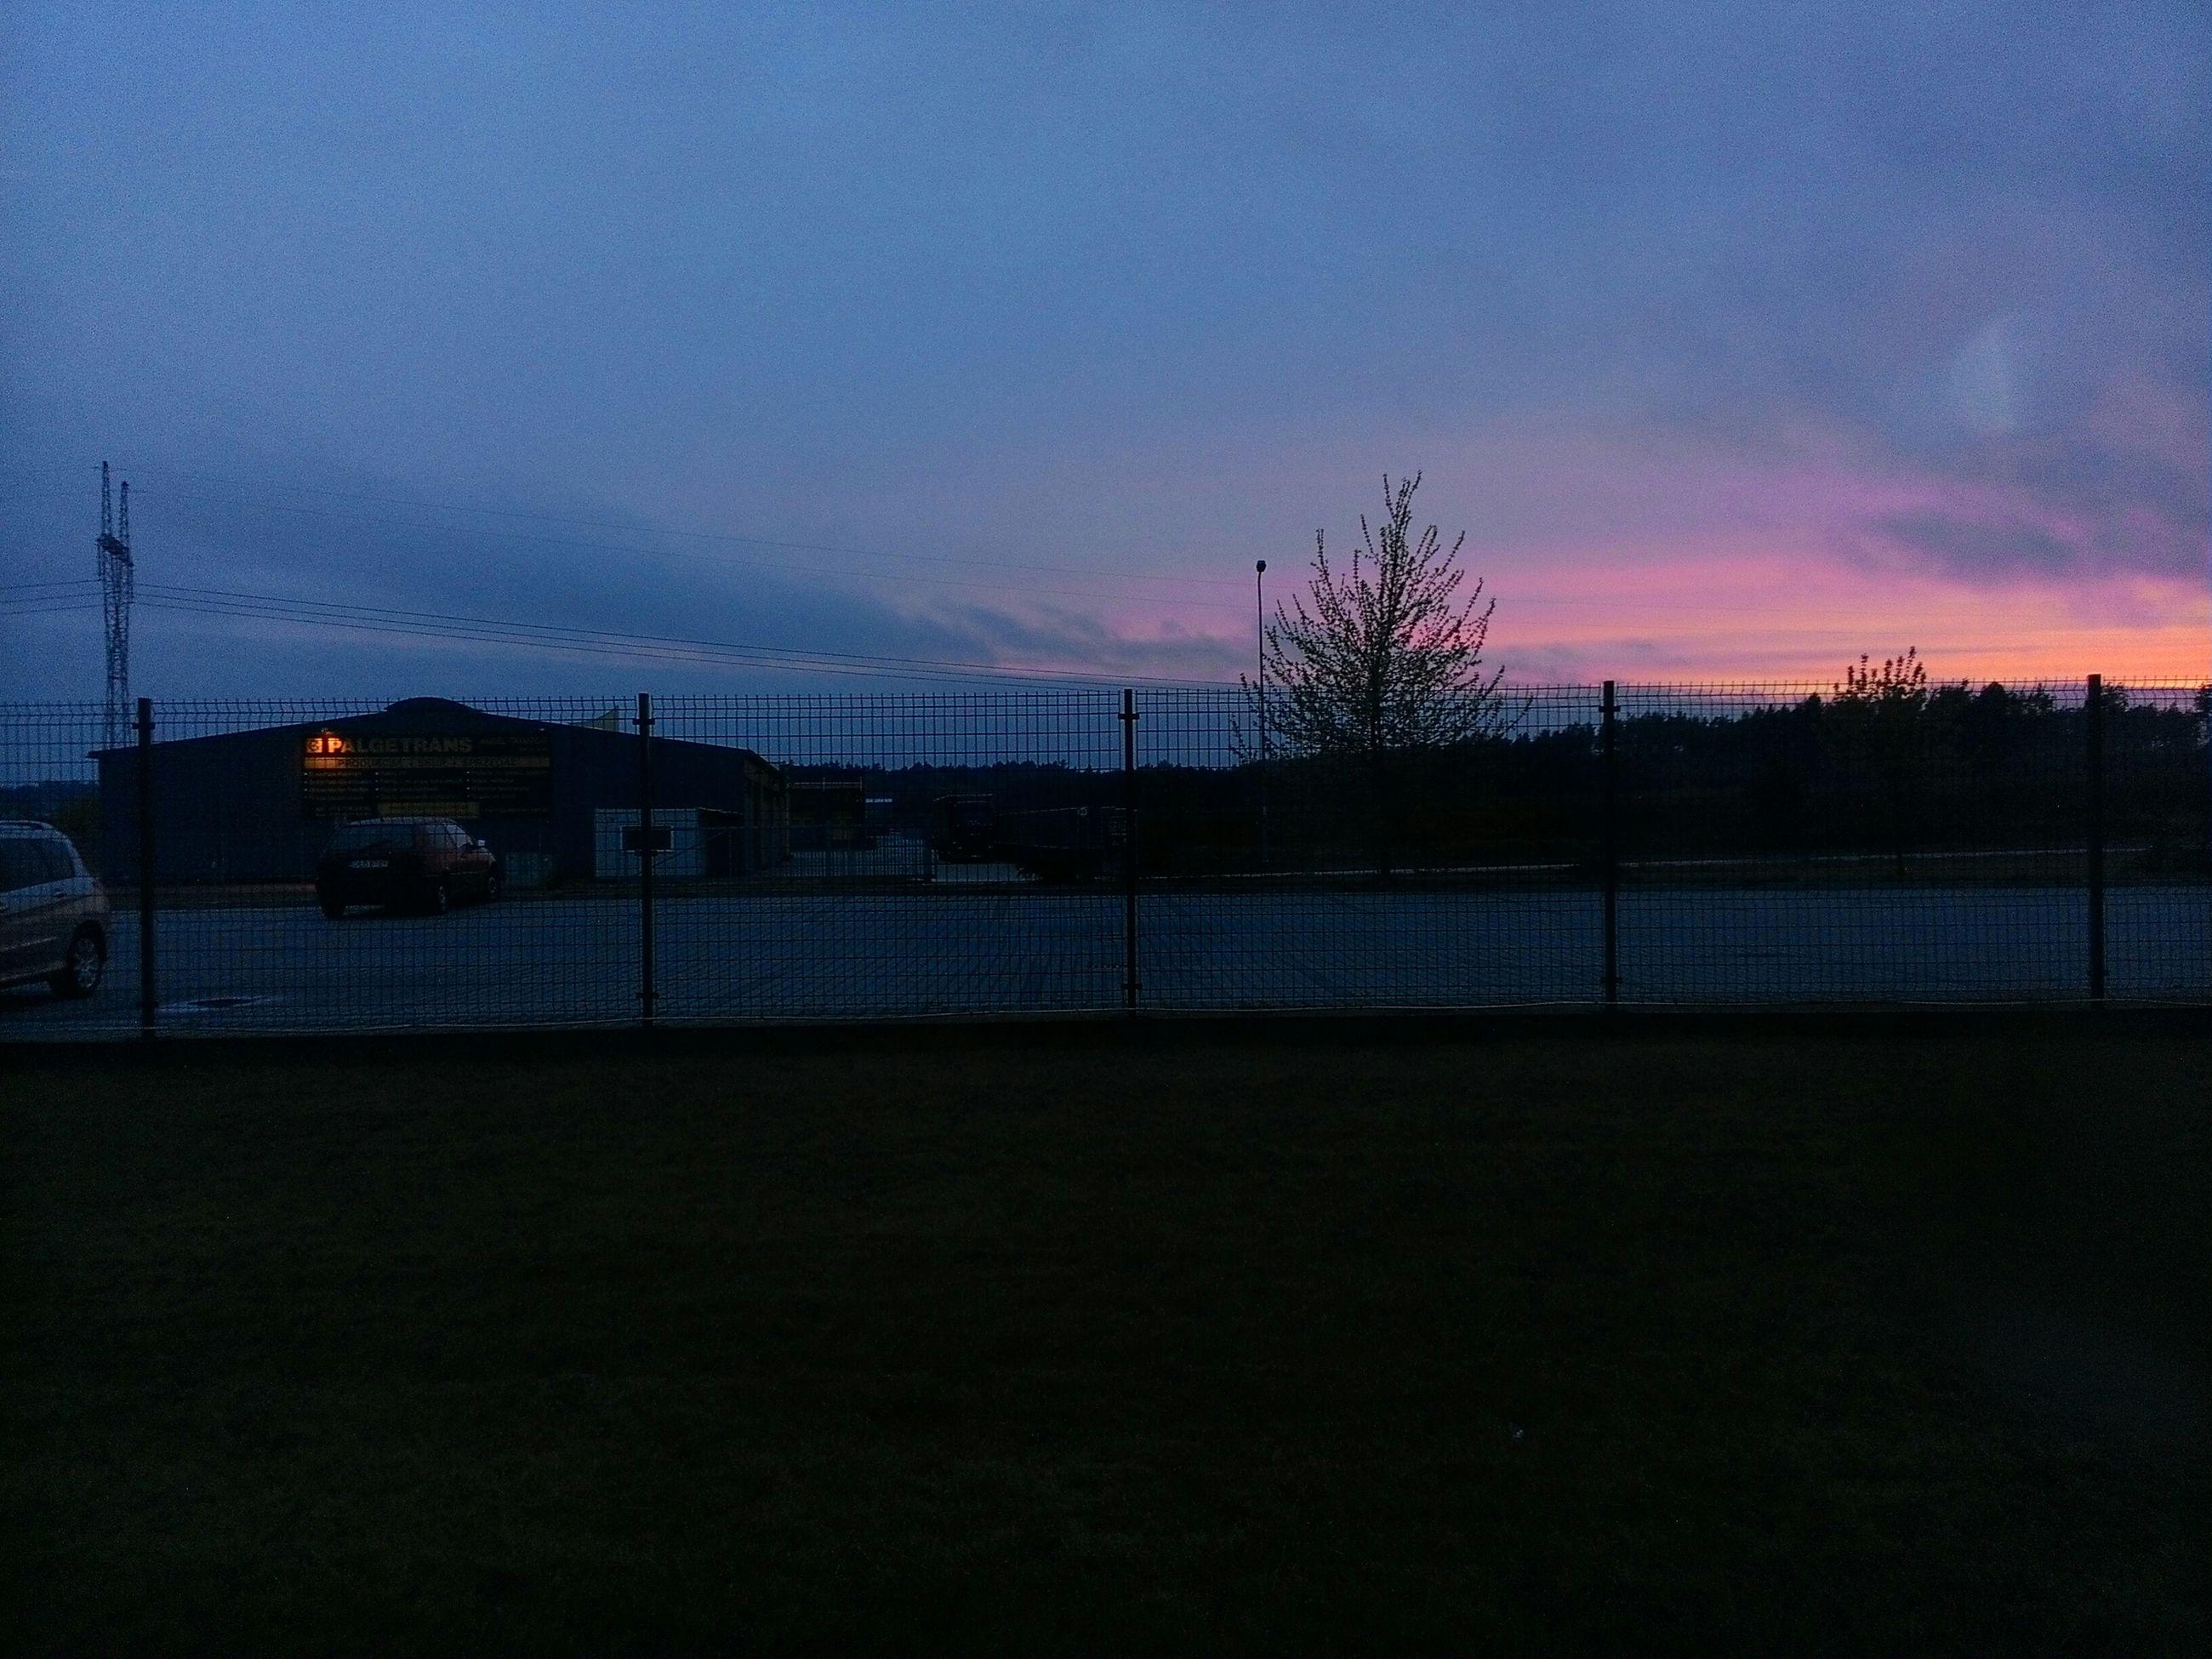 sunset, silhouette, sky, dusk, orange color, illuminated, dark, electricity pylon, tranquility, street light, tranquil scene, cloud - sky, scenics, nature, power line, landscape, outdoors, no people, beauty in nature, copy space